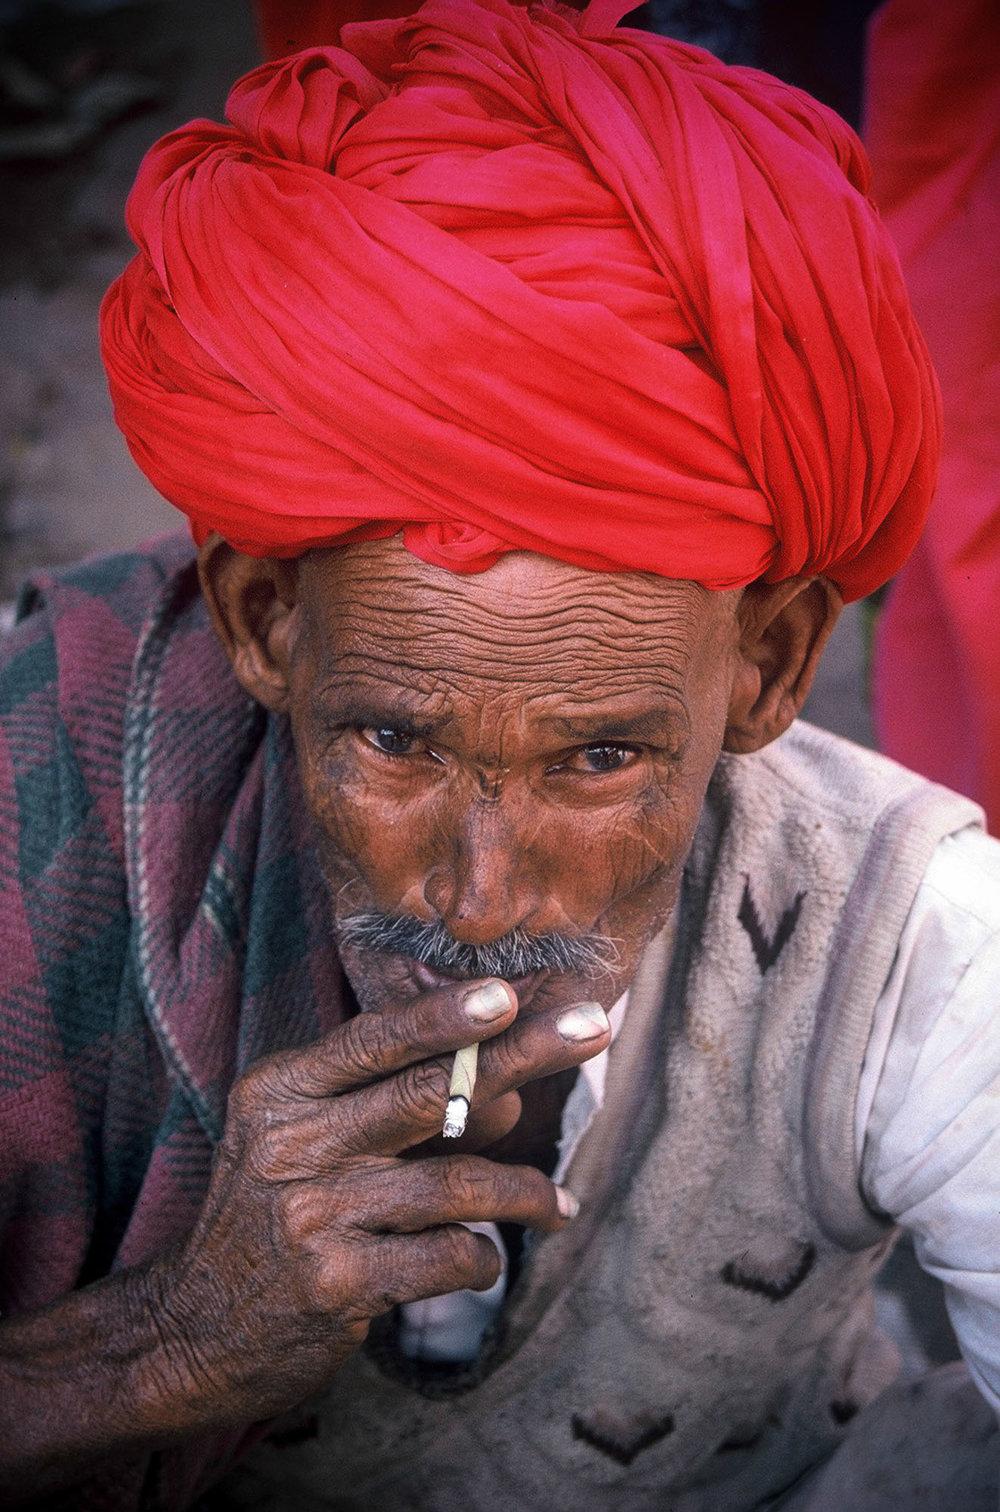 travel-photographer-oxford-london-jonathan-self-photography-1.jpg